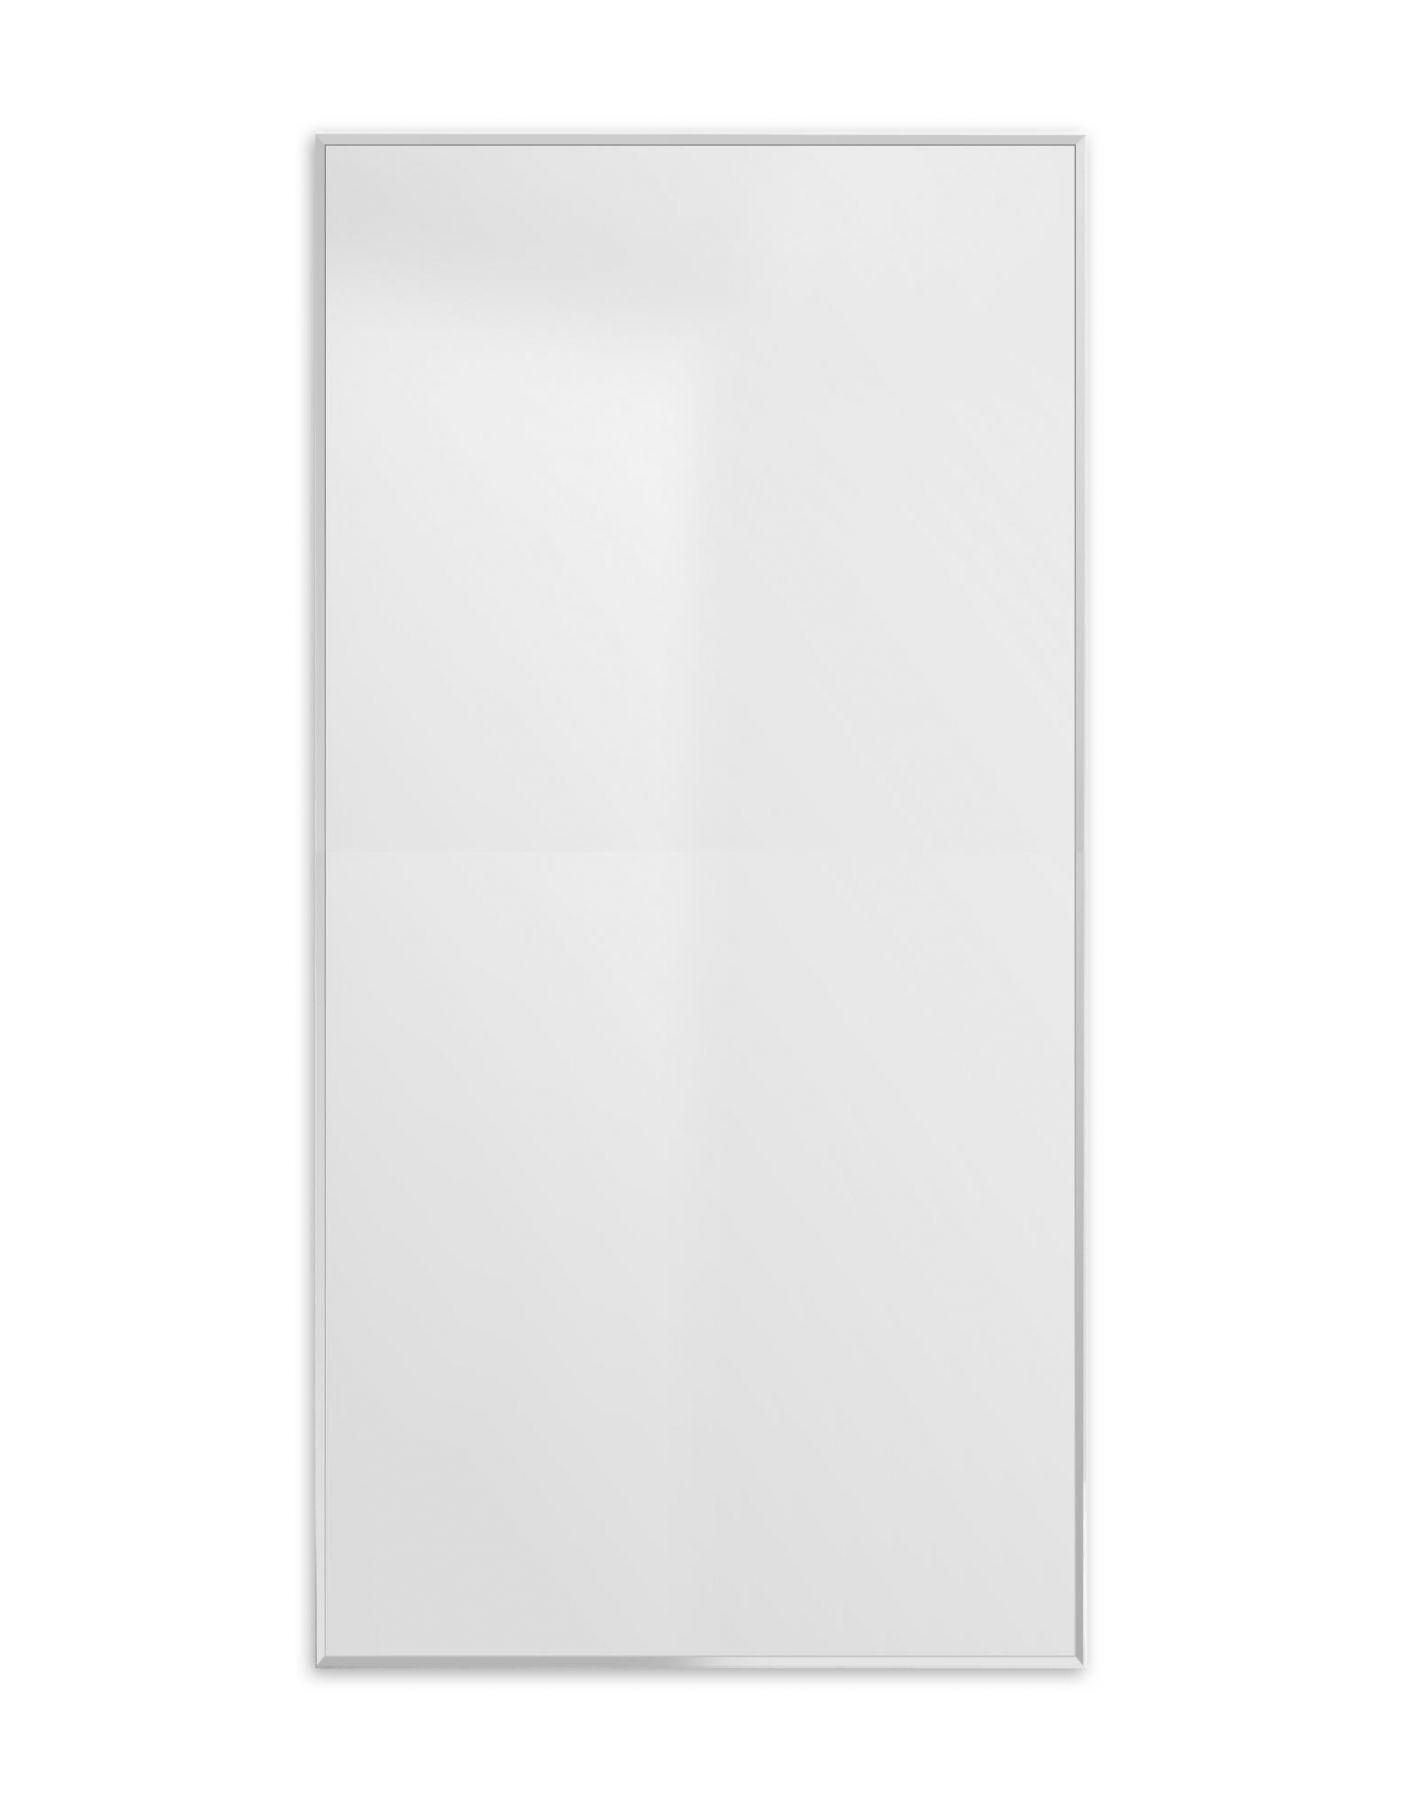 Зеркало в душевую зону BelBagno SPC-AL-500-900 ФОТО